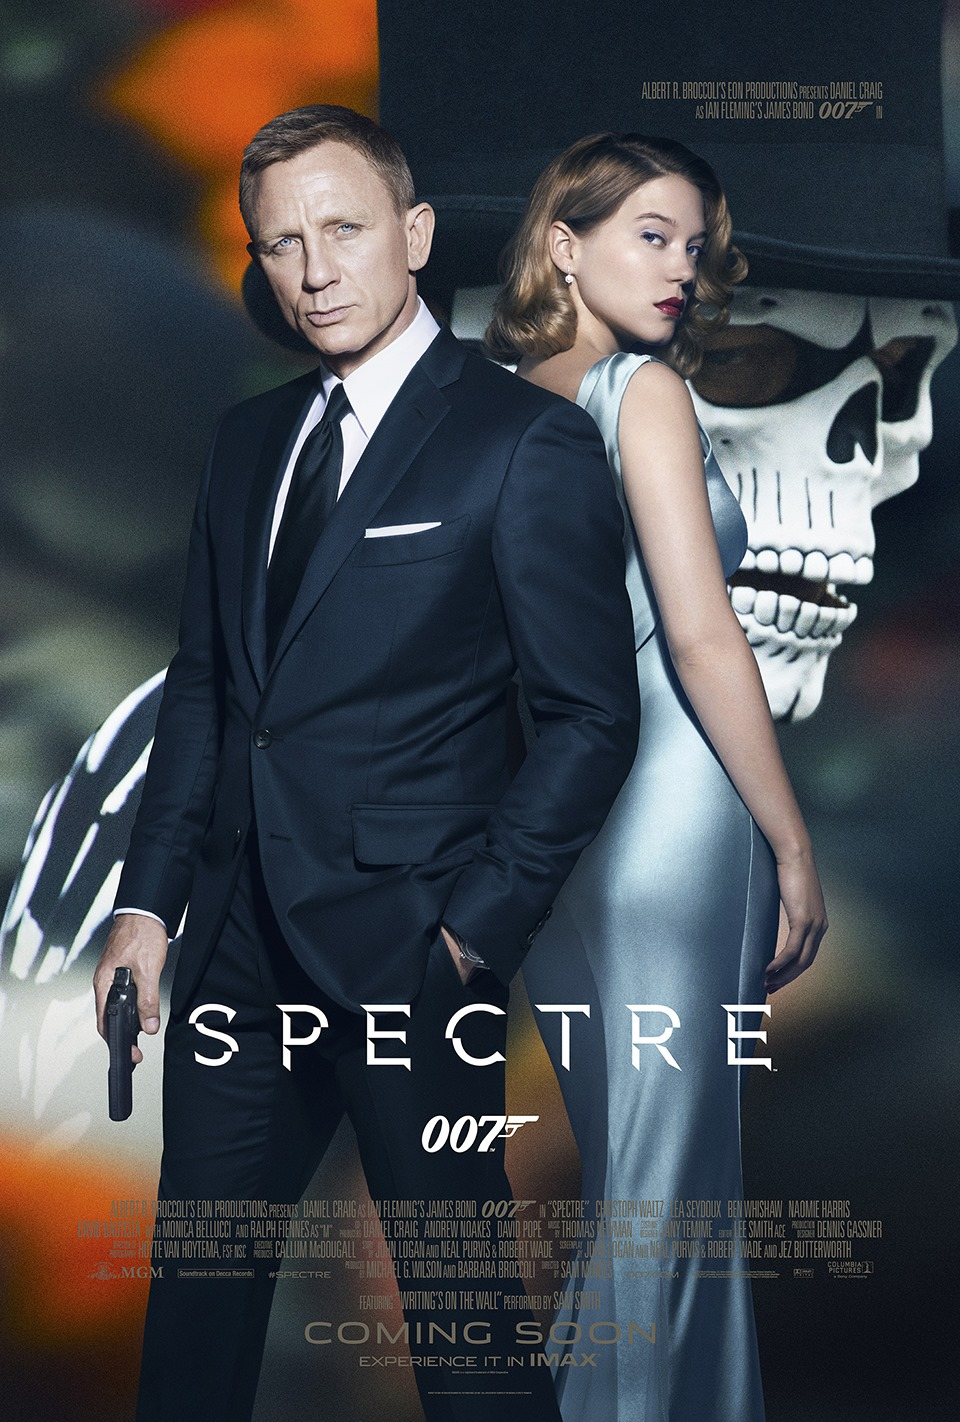 Bond's latest installment fails to meet high expectations